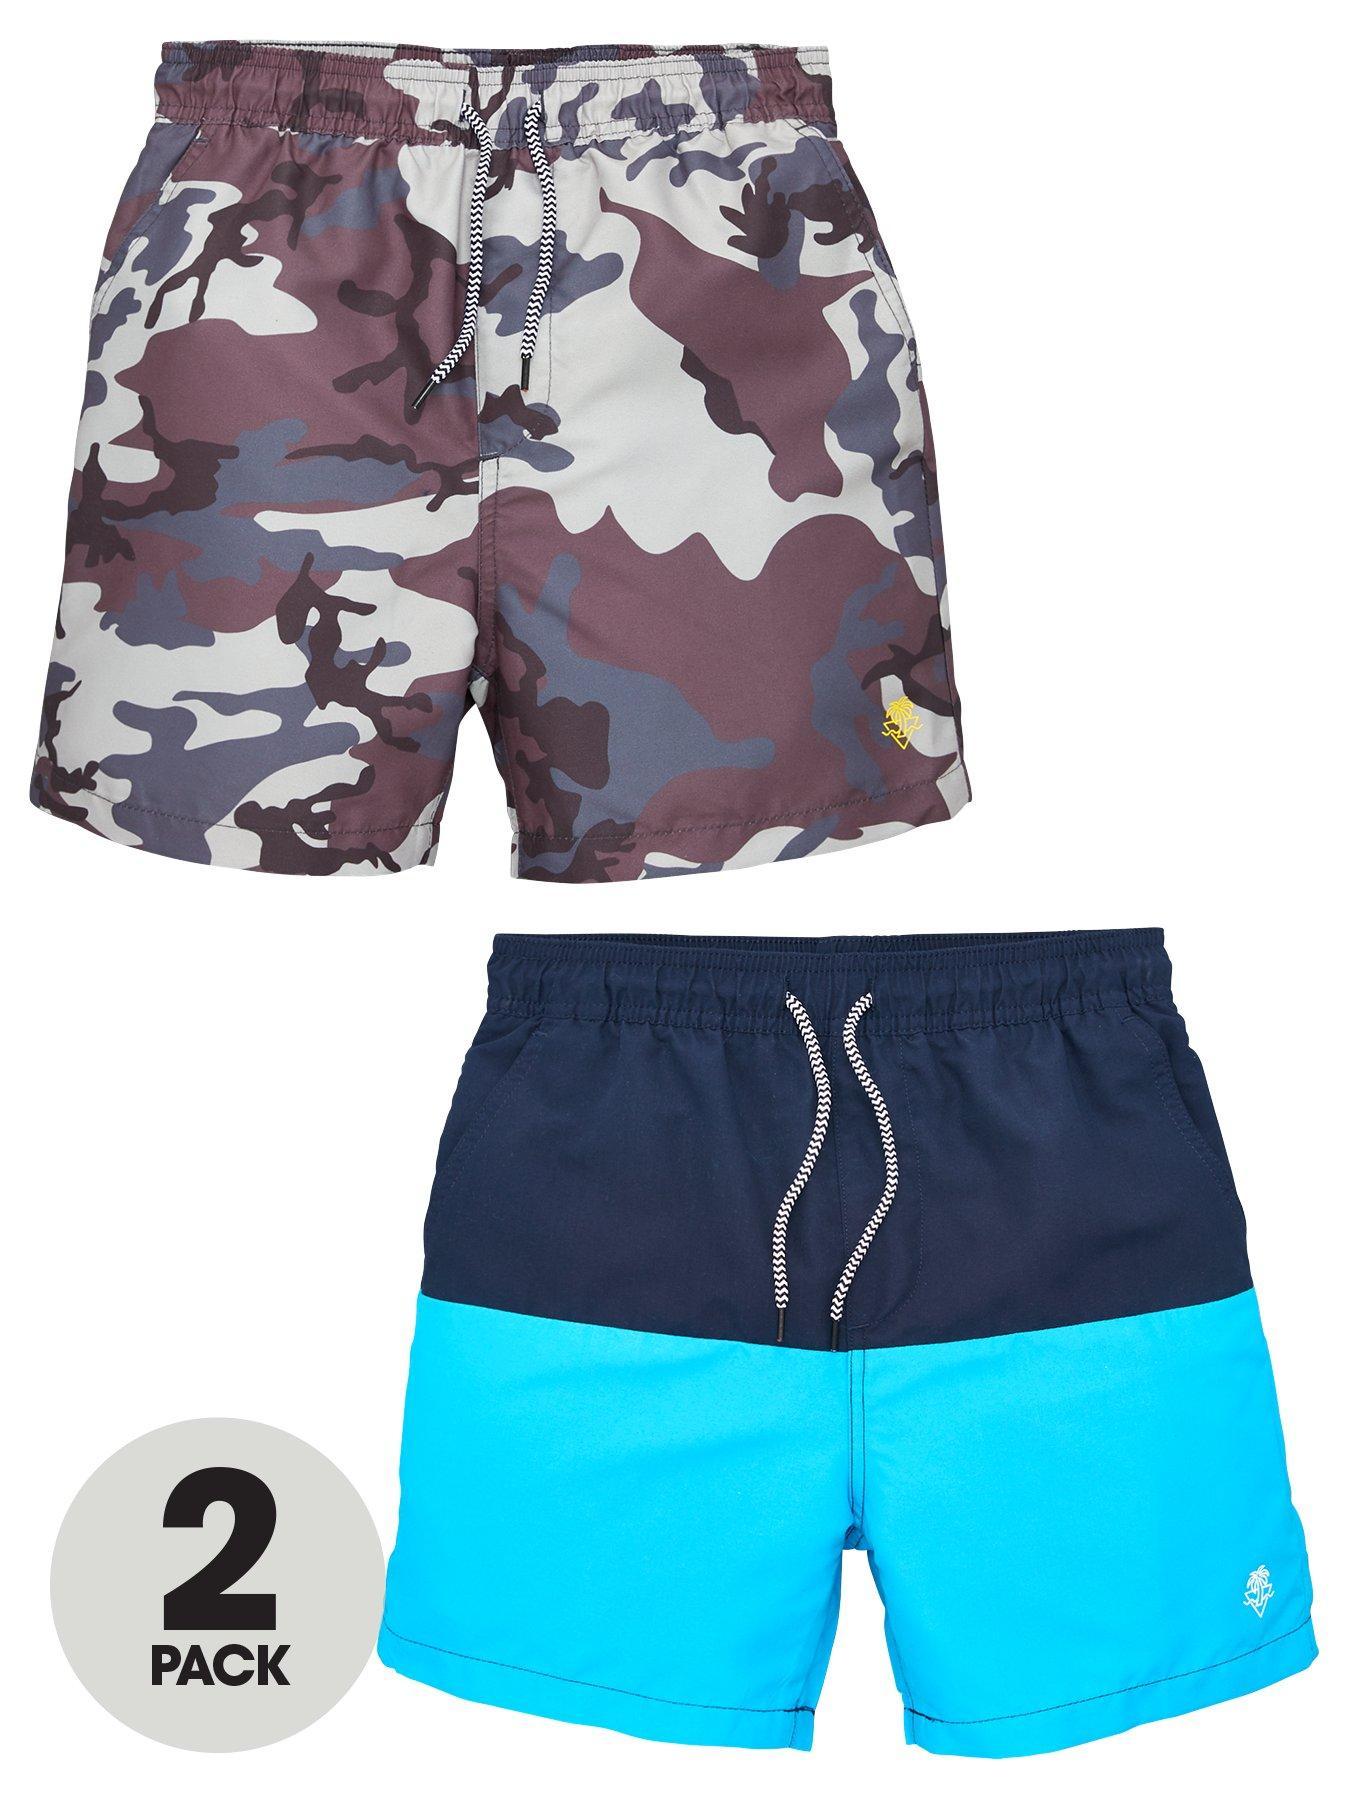 Baby Boys 2 pack Swim Trunks 1 x Light Blue with White Trim 1 x Navy Blue